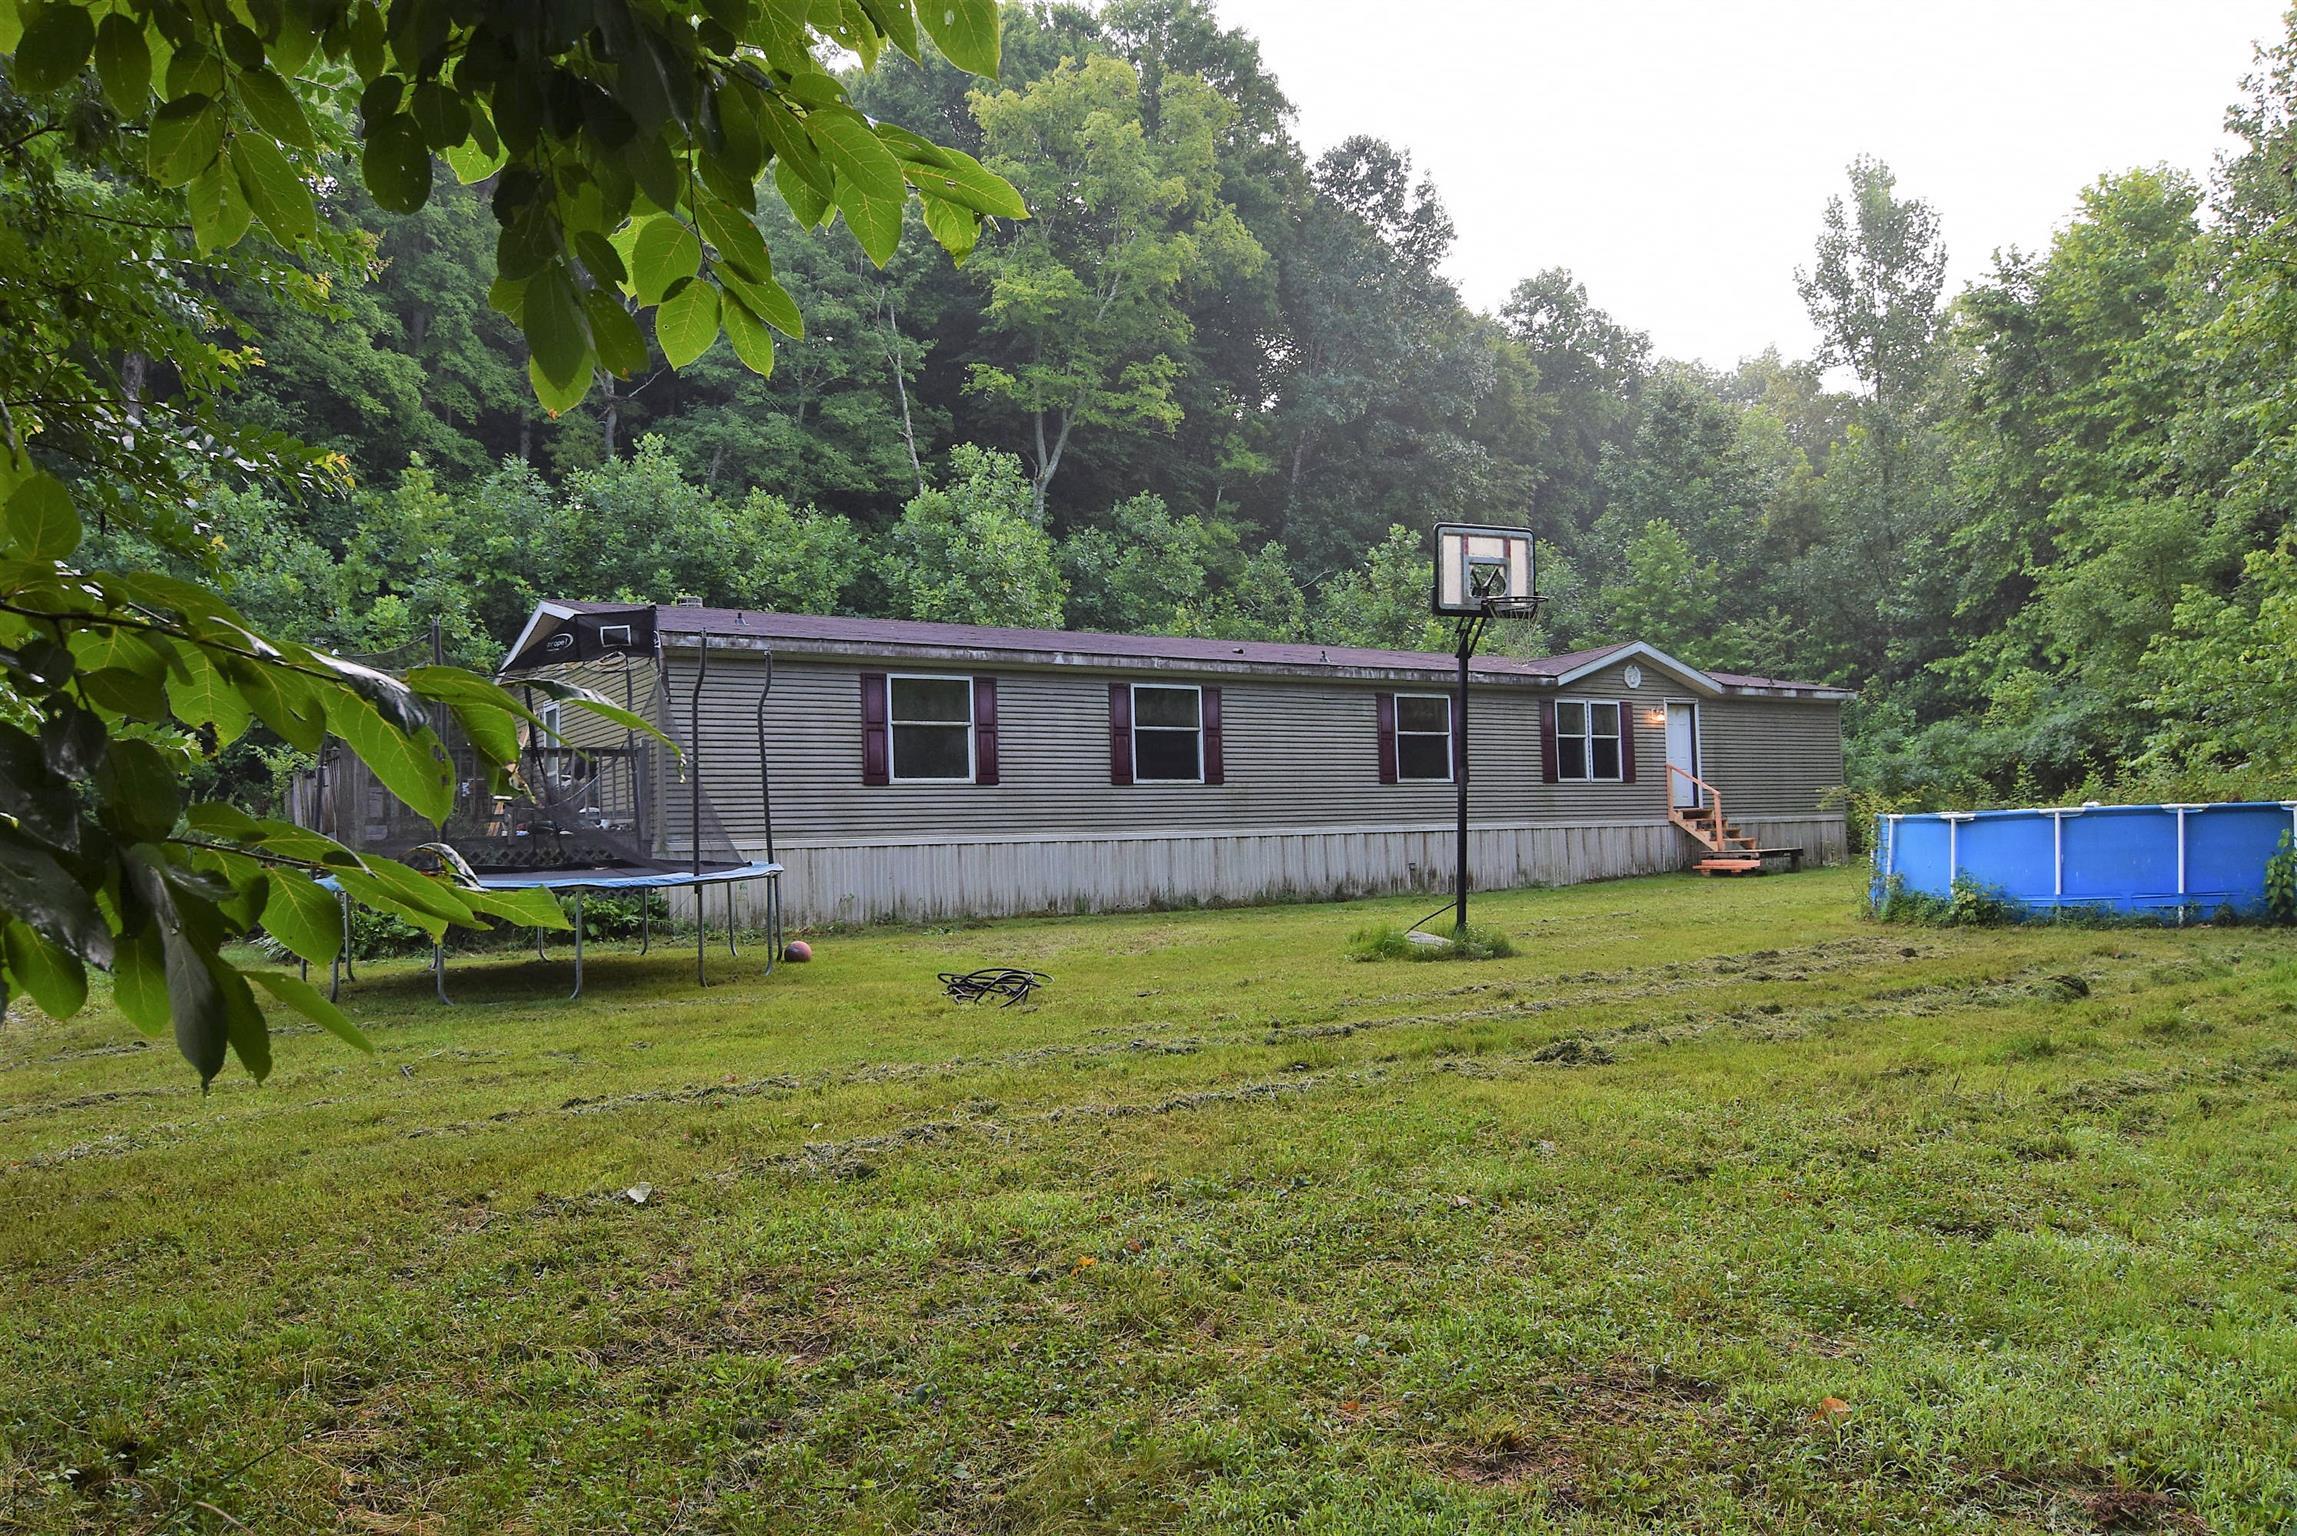 13310 Johnson Mill Rd, Crofton, KY 42217 - Crofton, KY real estate listing